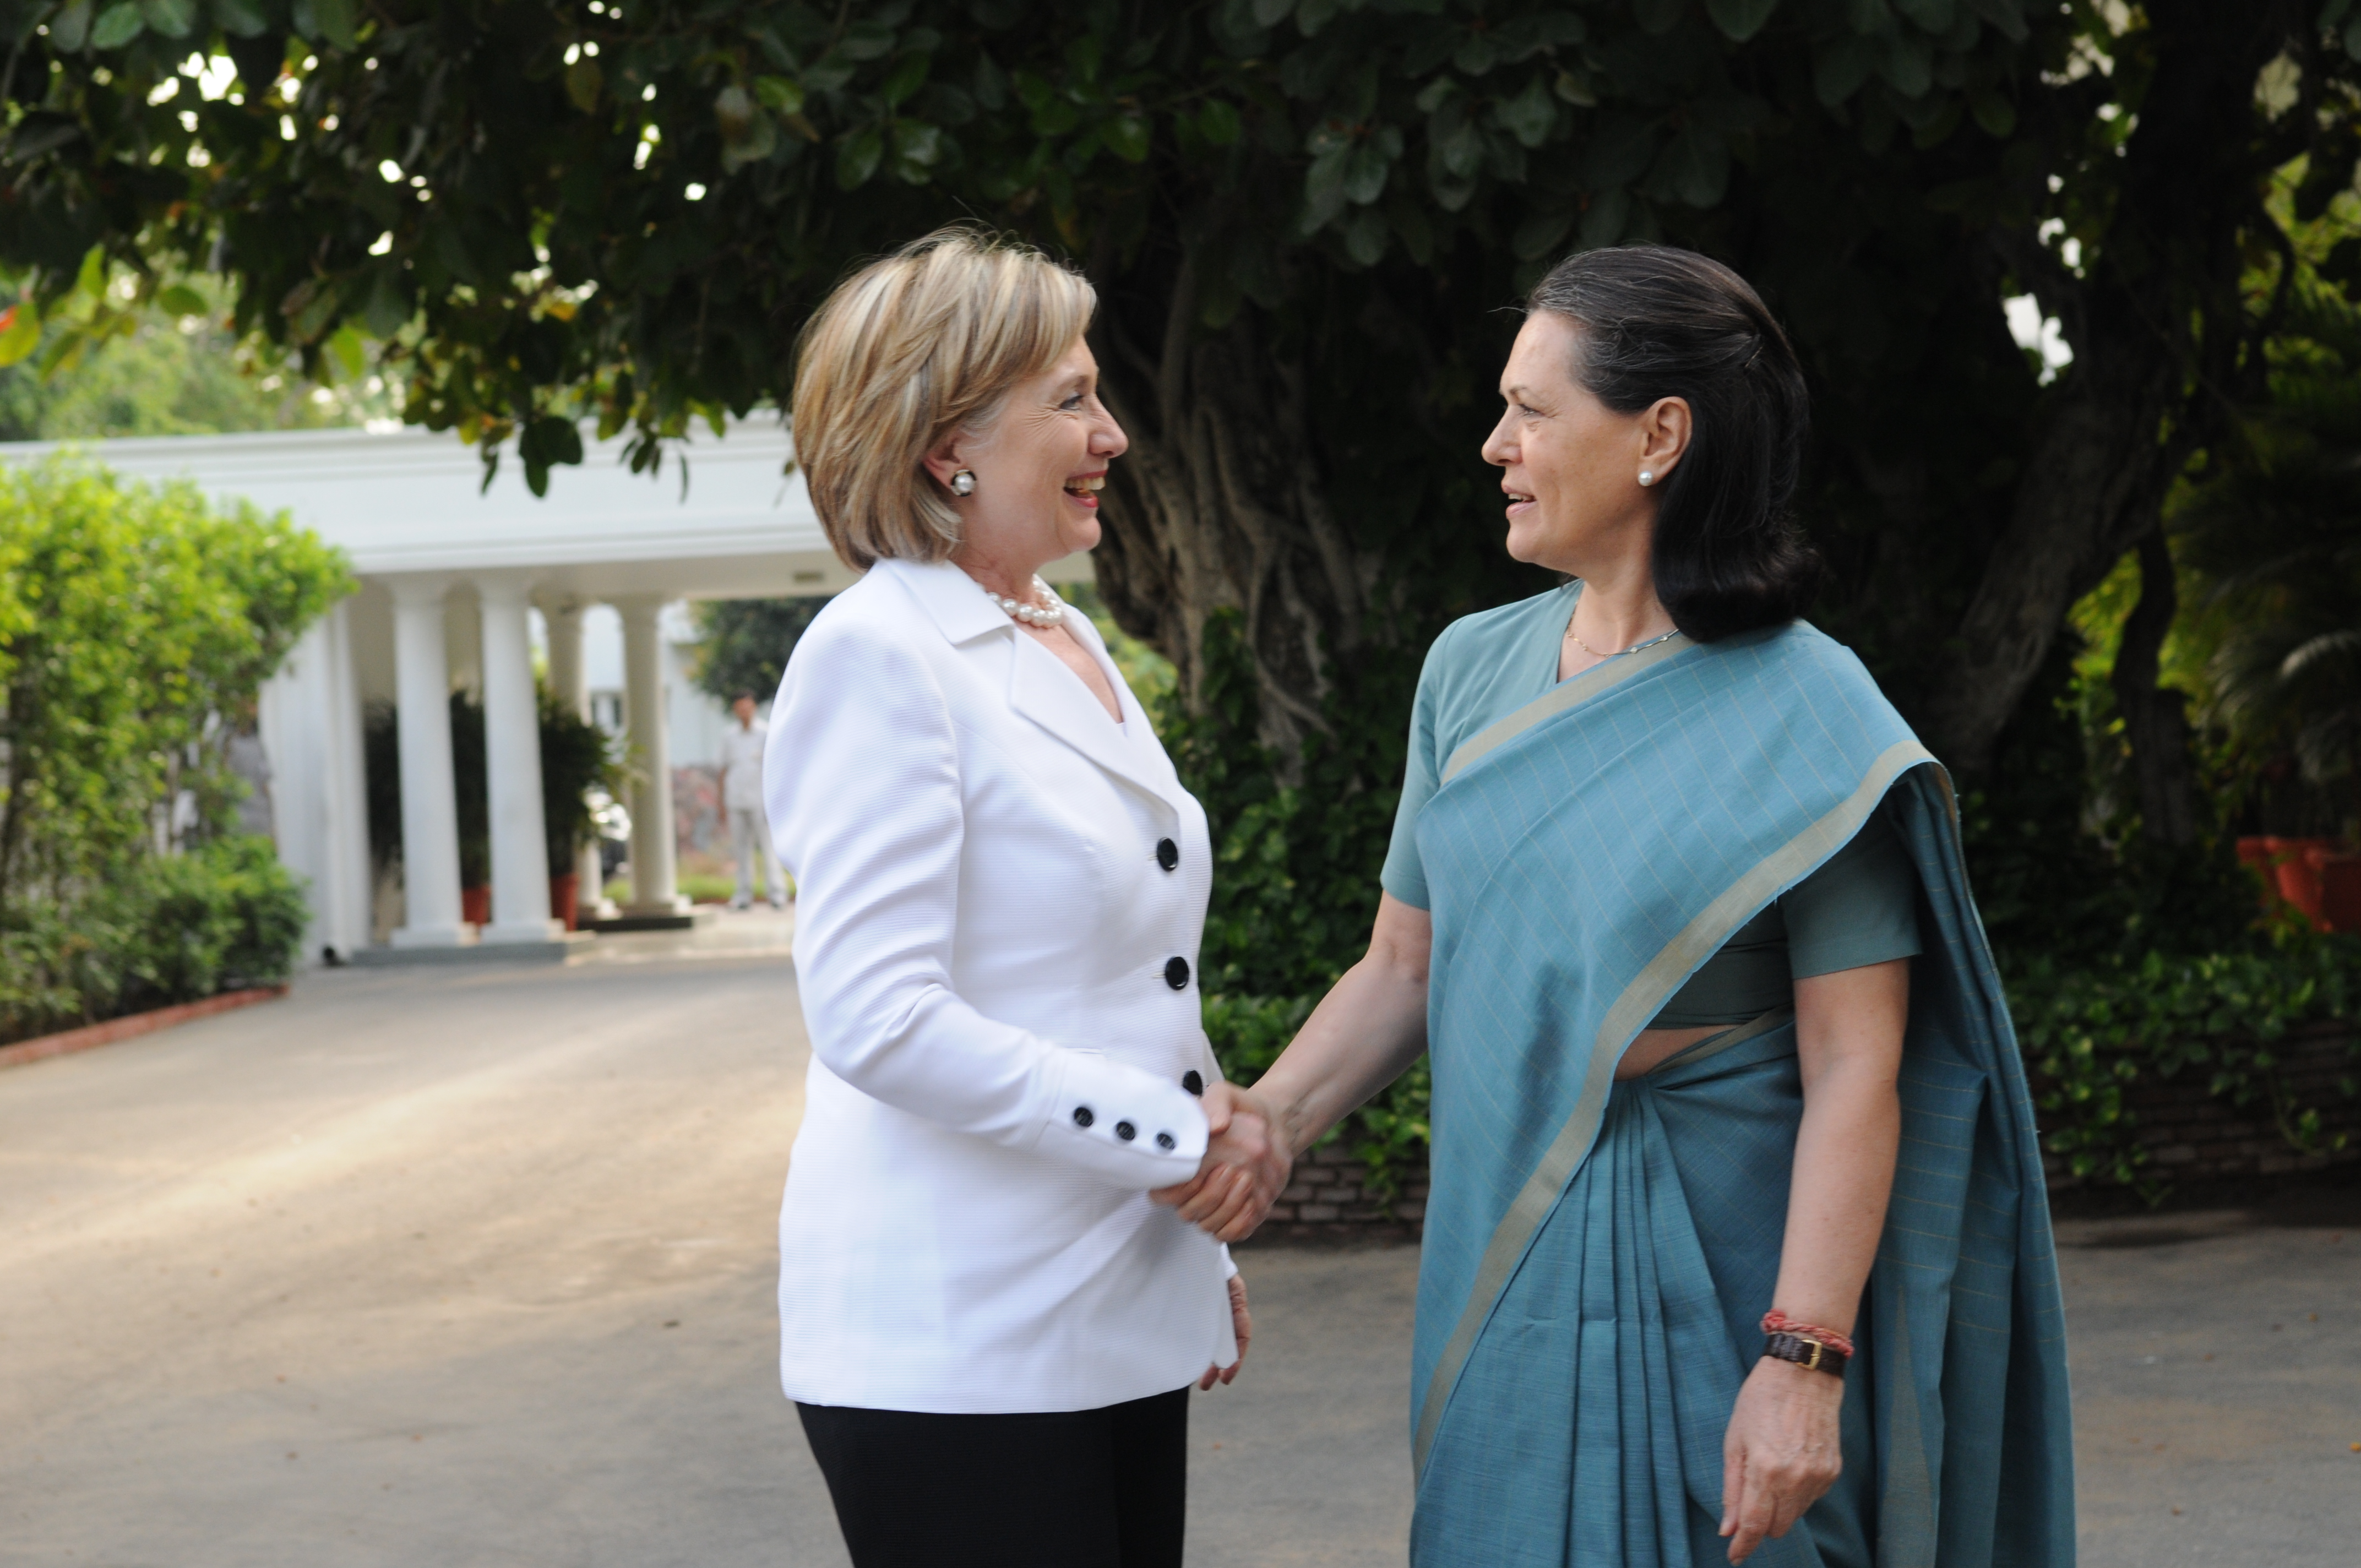 file sonia gandhi welcomes u s secretary of state hillary rodham file sonia gandhi welcomes u s secretary of state hillary rodham jpg